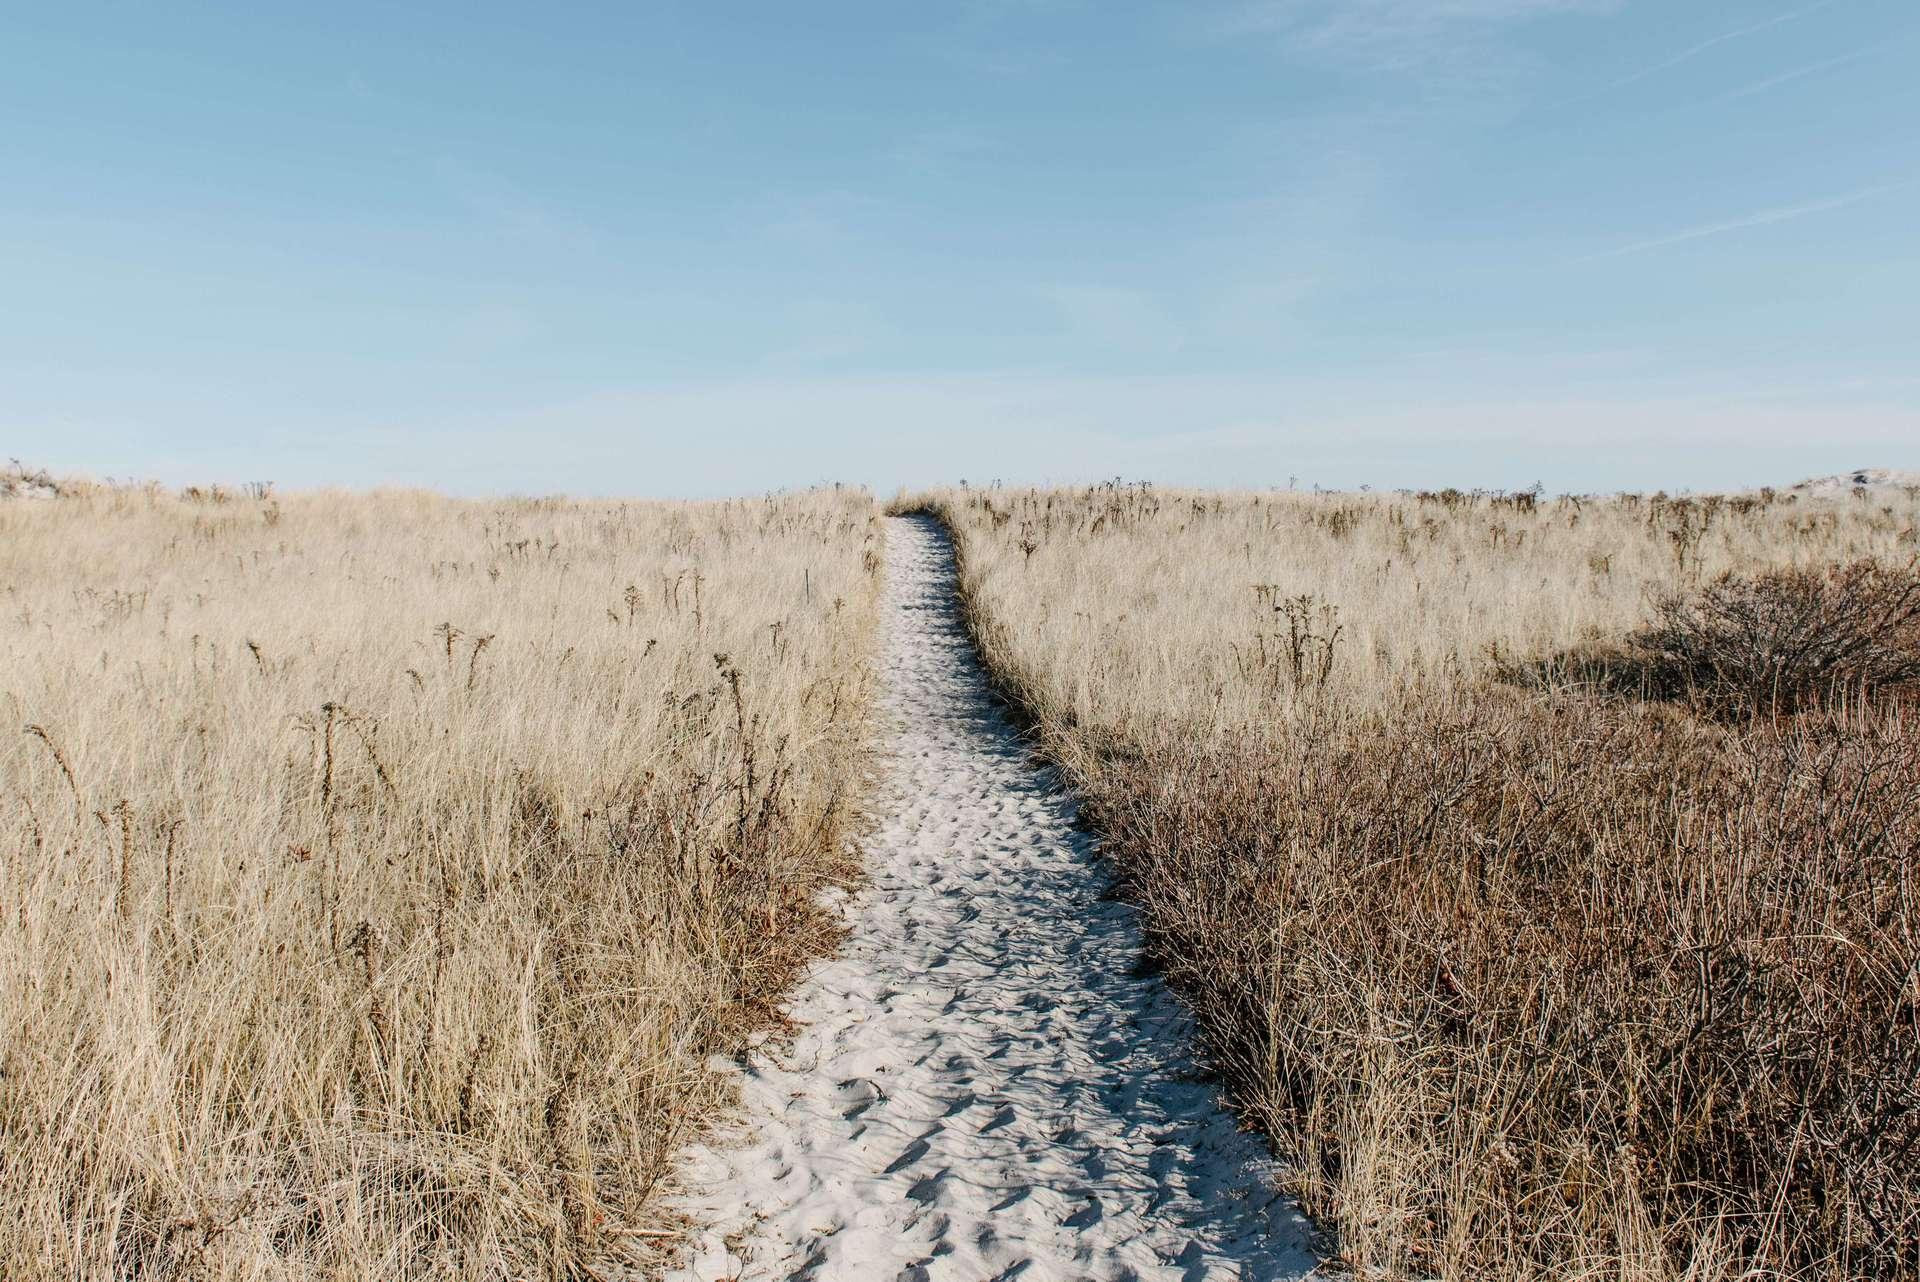 preparing for the journey - contemplative prayer